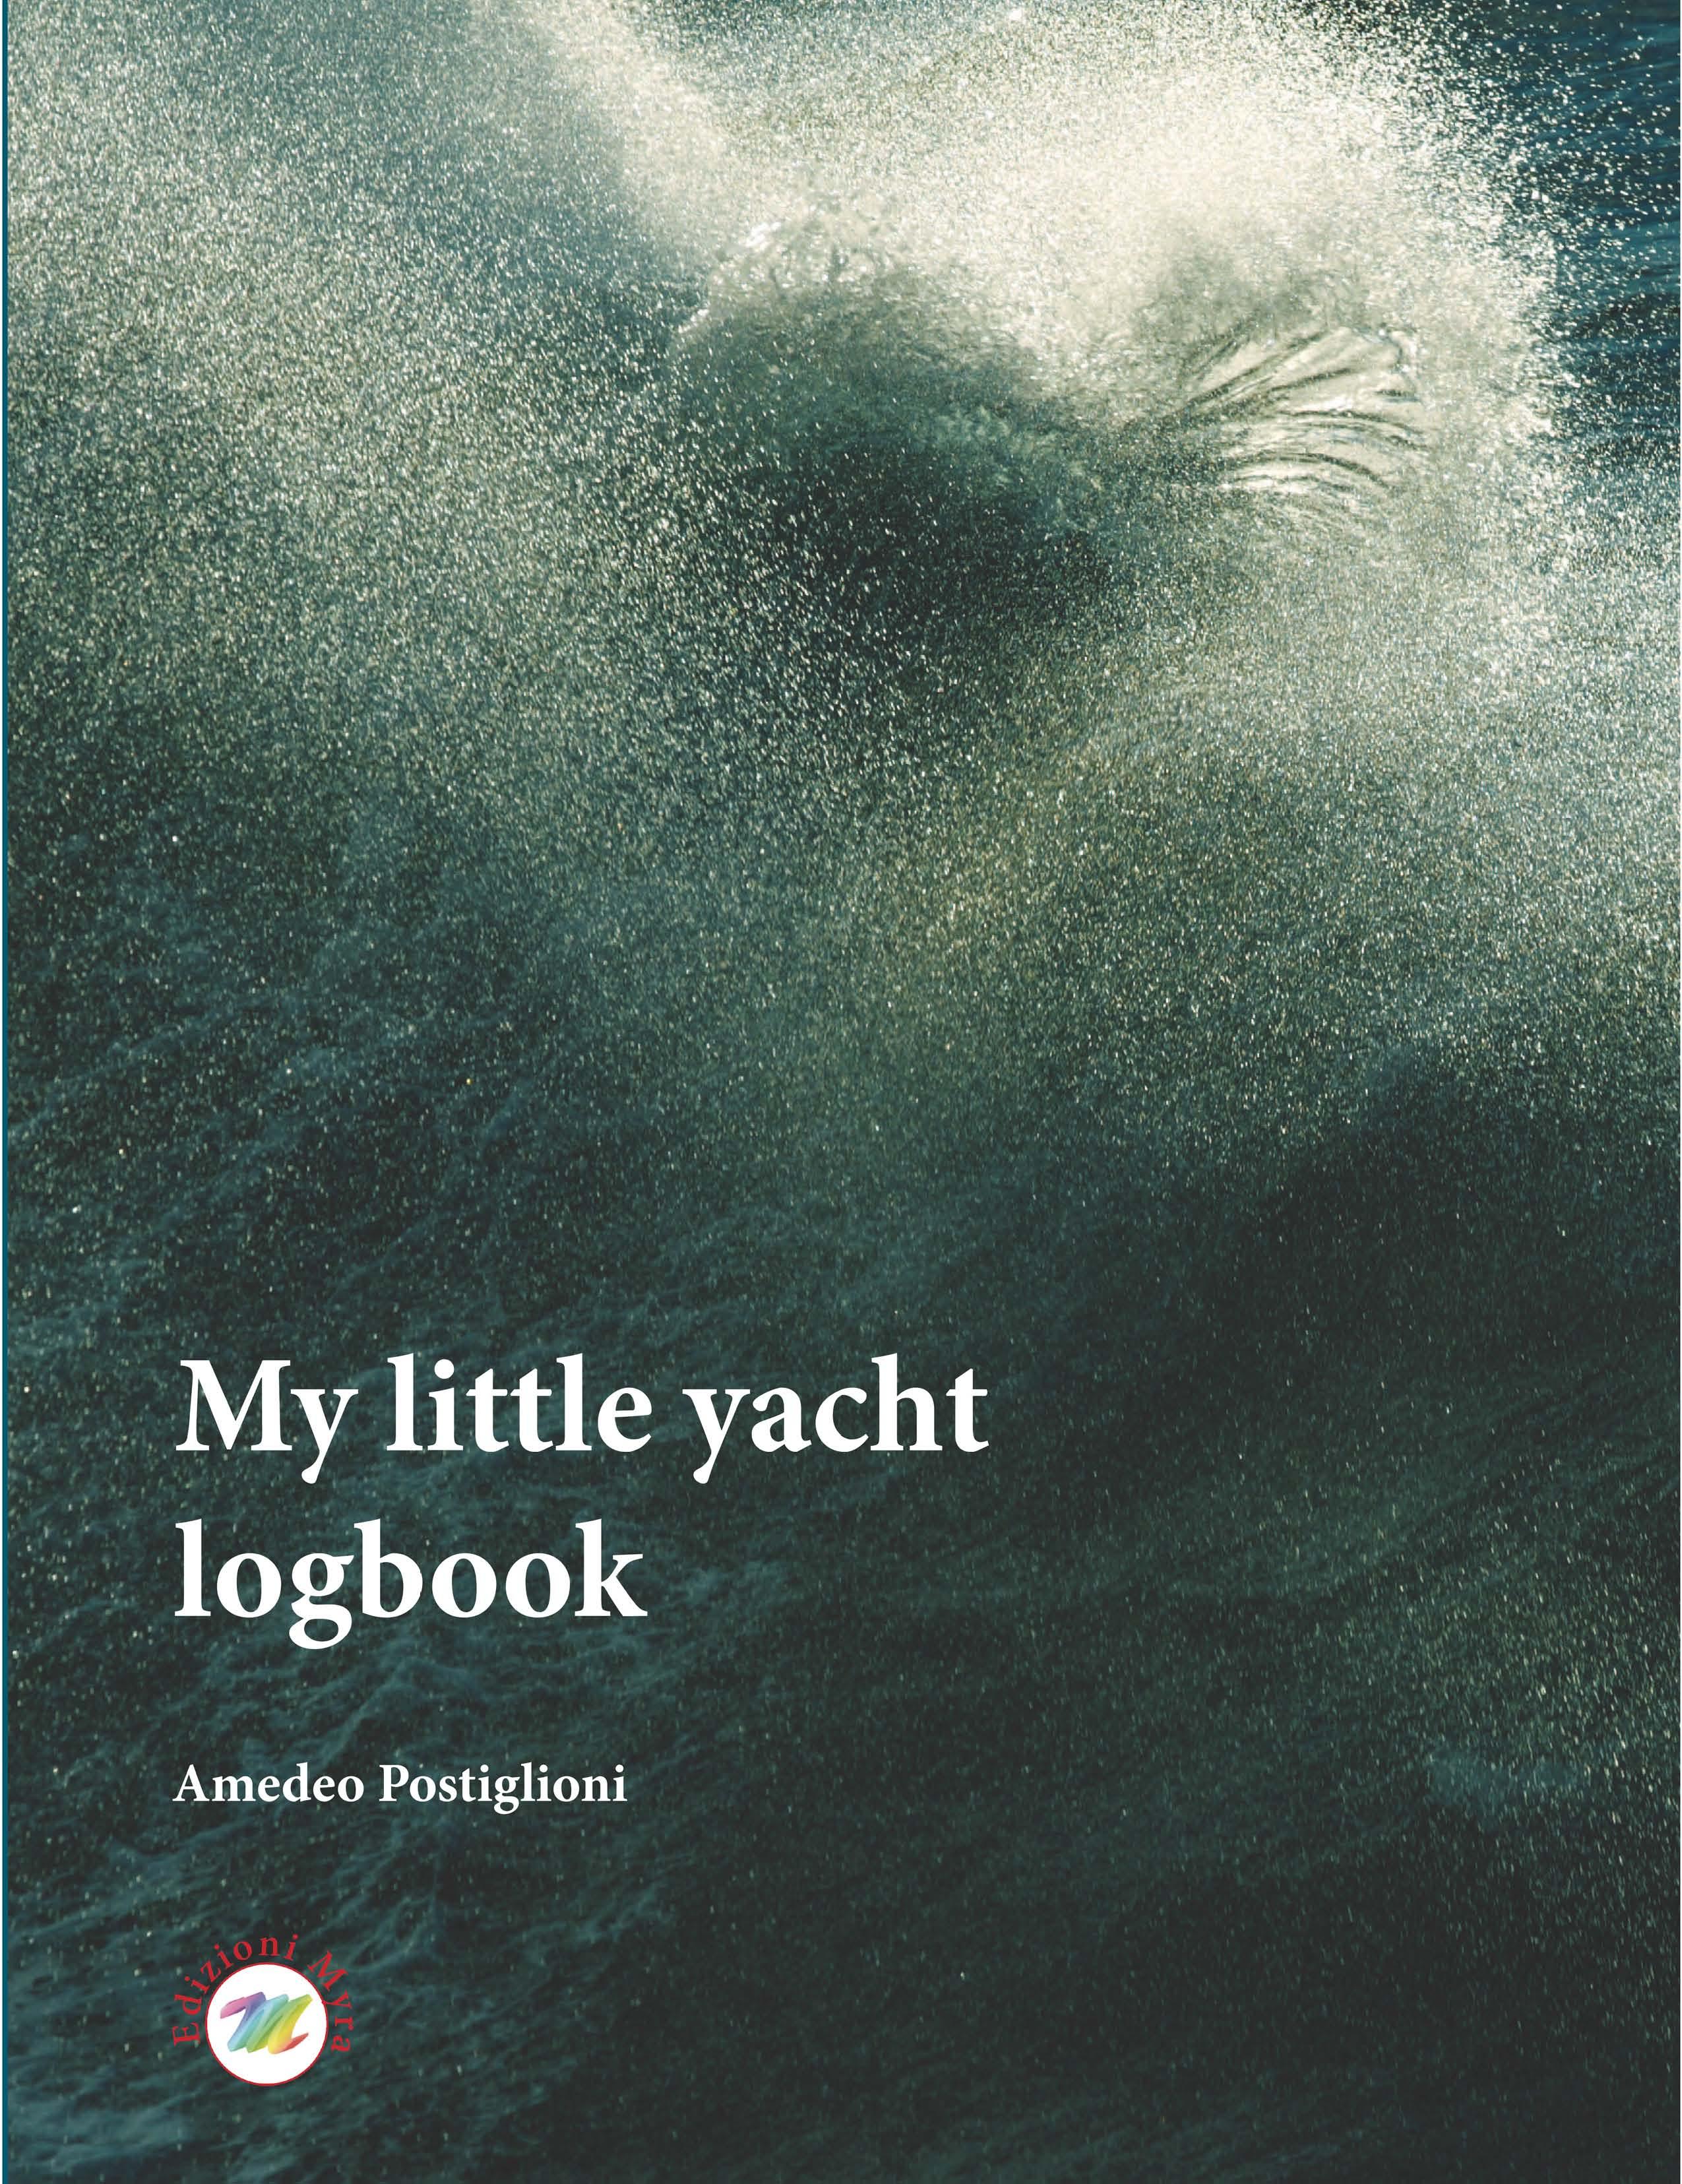 My little yacht logbook